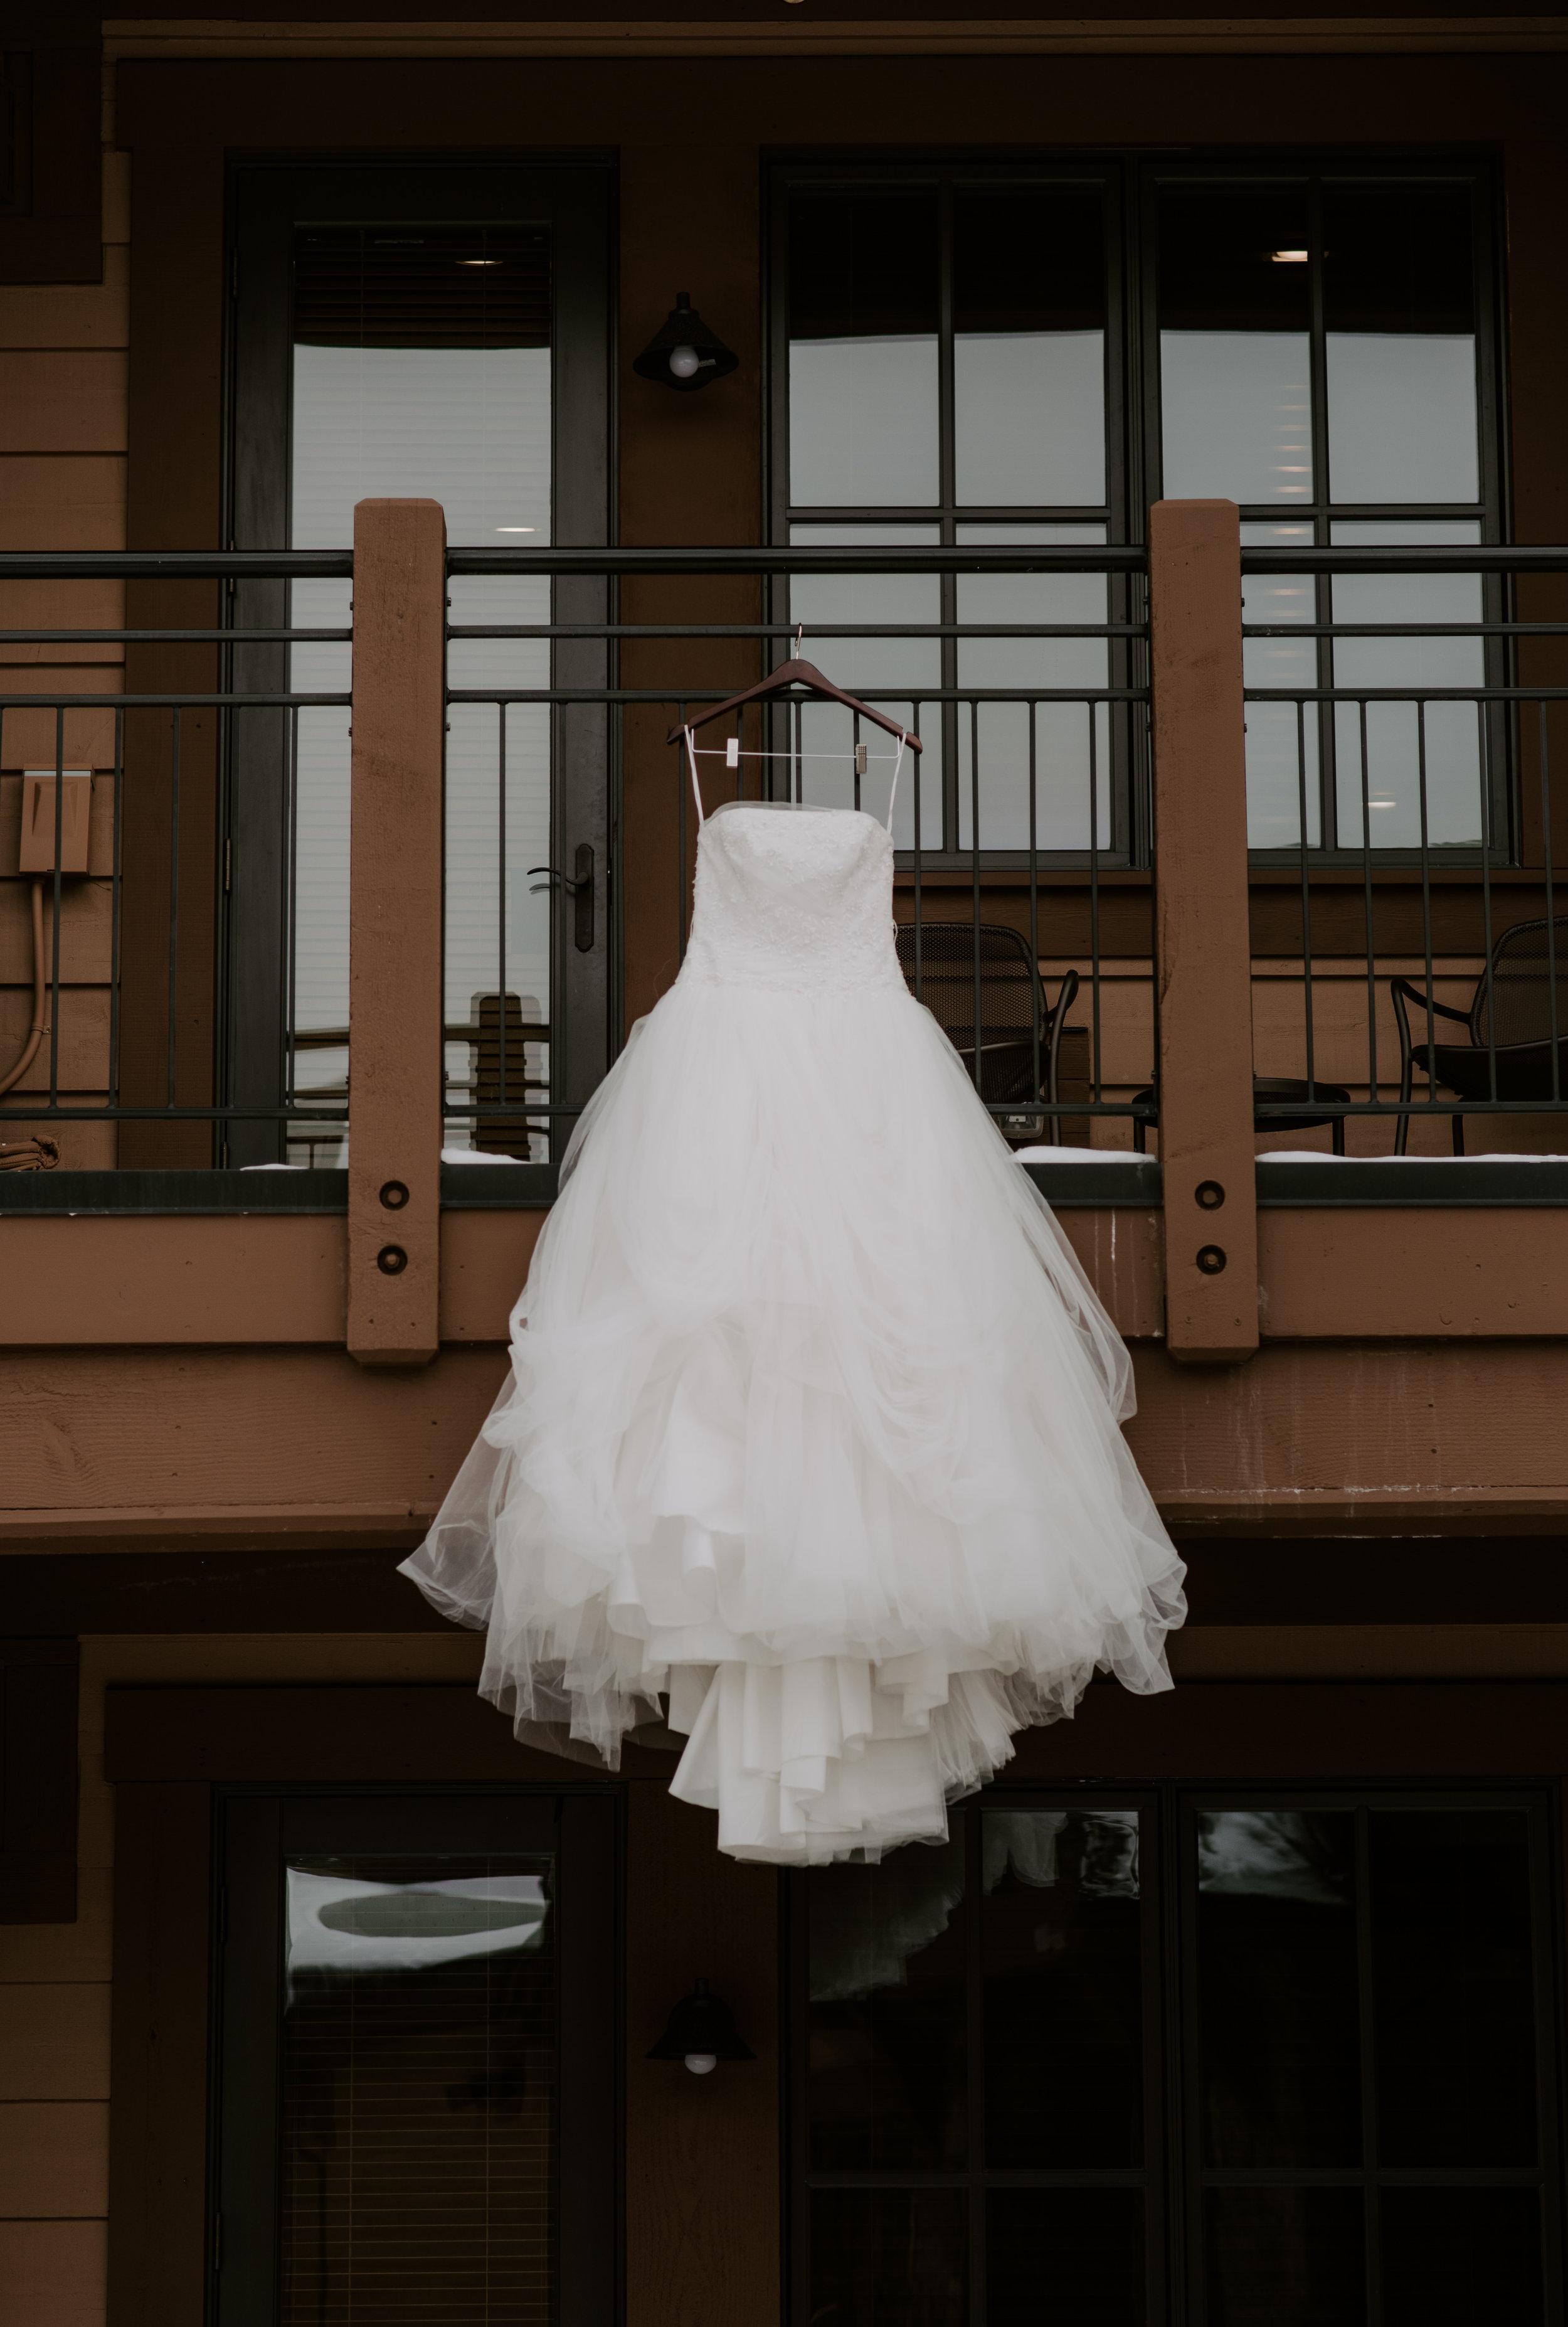 Wedding dress shot by Alyssa Reinhold, Colorado wedding photographer.